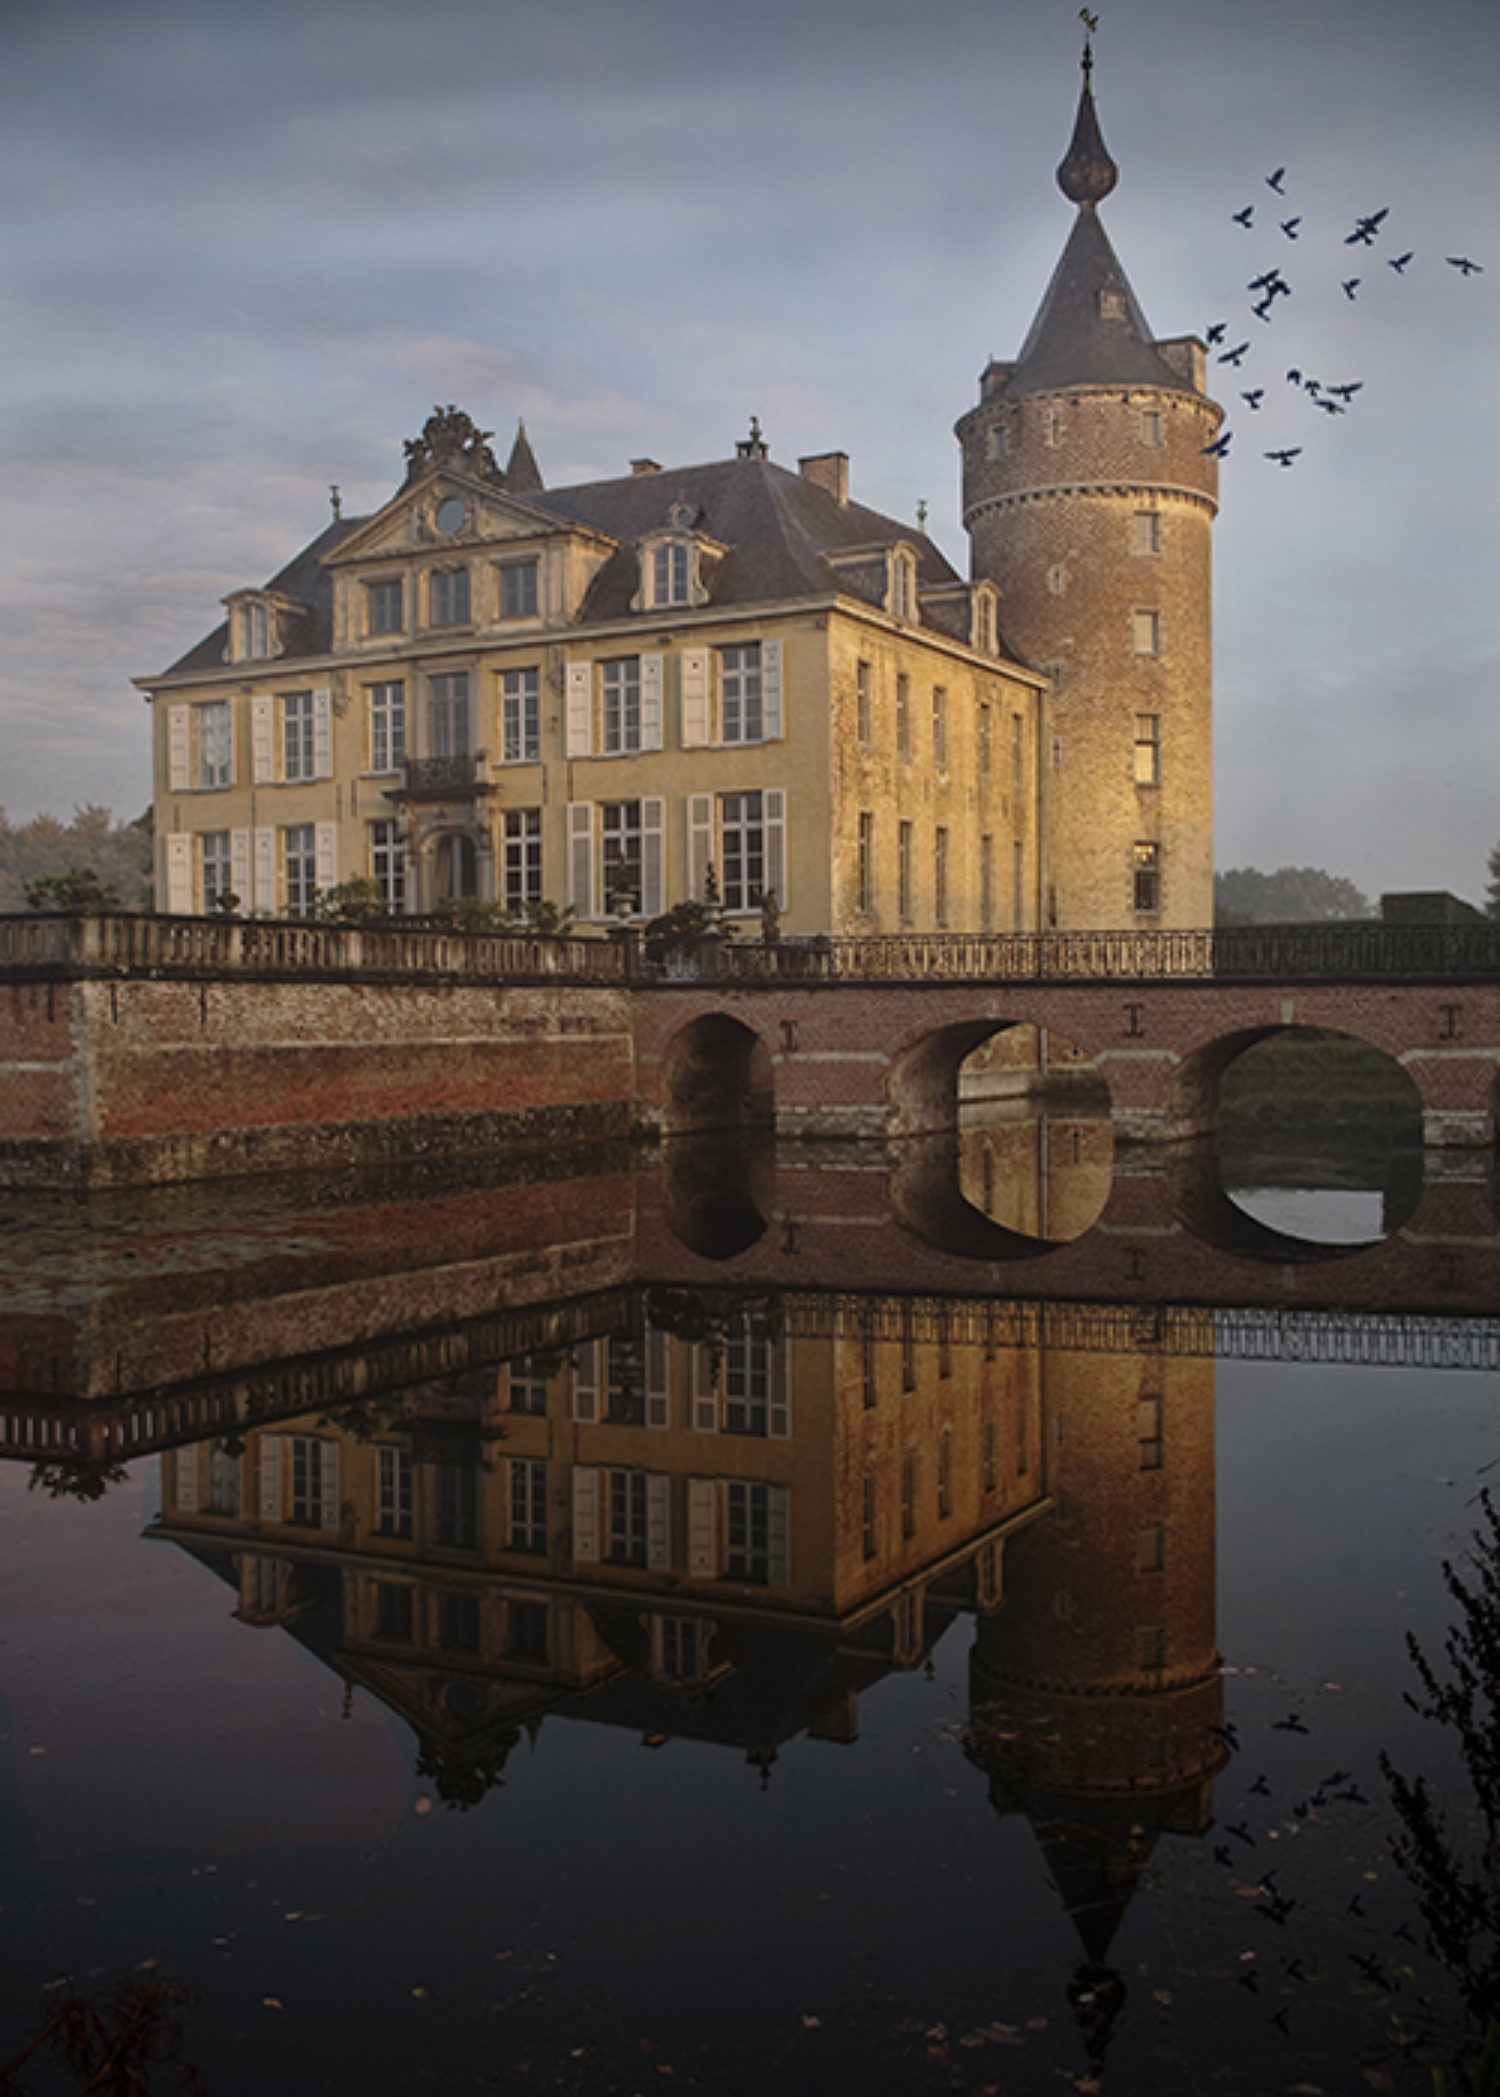 The Castle of 's-Gravenwezel and surrounding moat and bridge